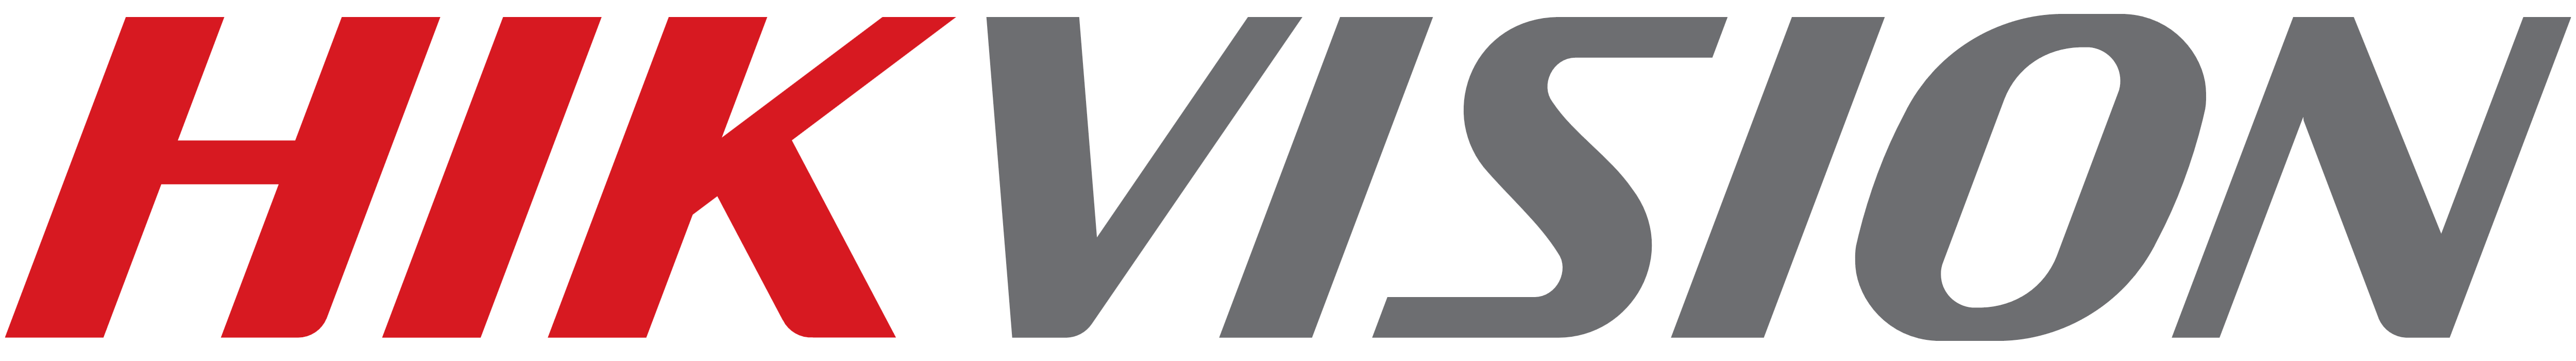 WA tecnologia-cftv-seguranca-camera-wa-tecno-tecnologia-seguranca-manutencao-instalacao-sistemas